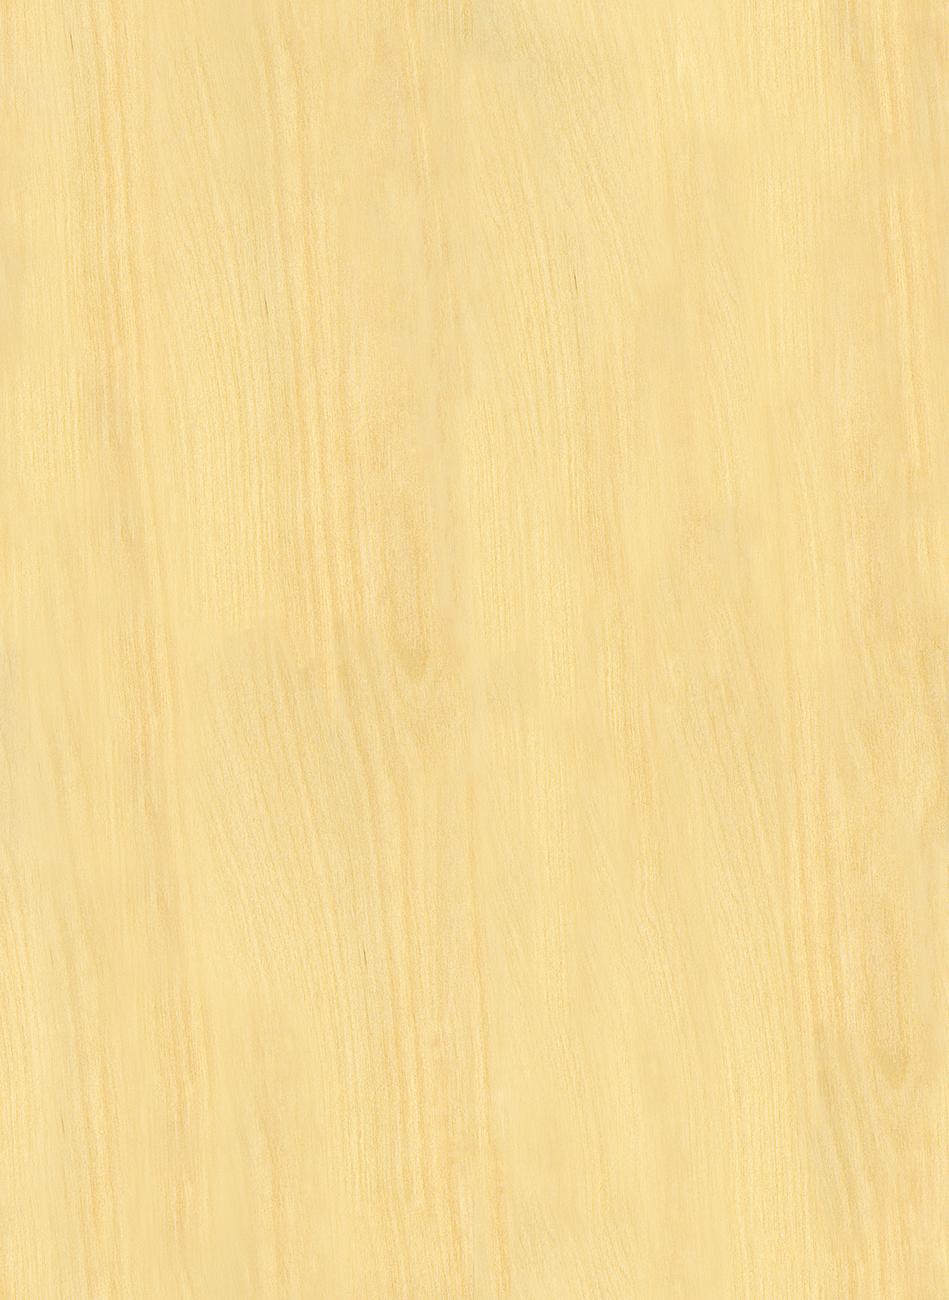 23_maple light wood fine texture-seamless.jpg